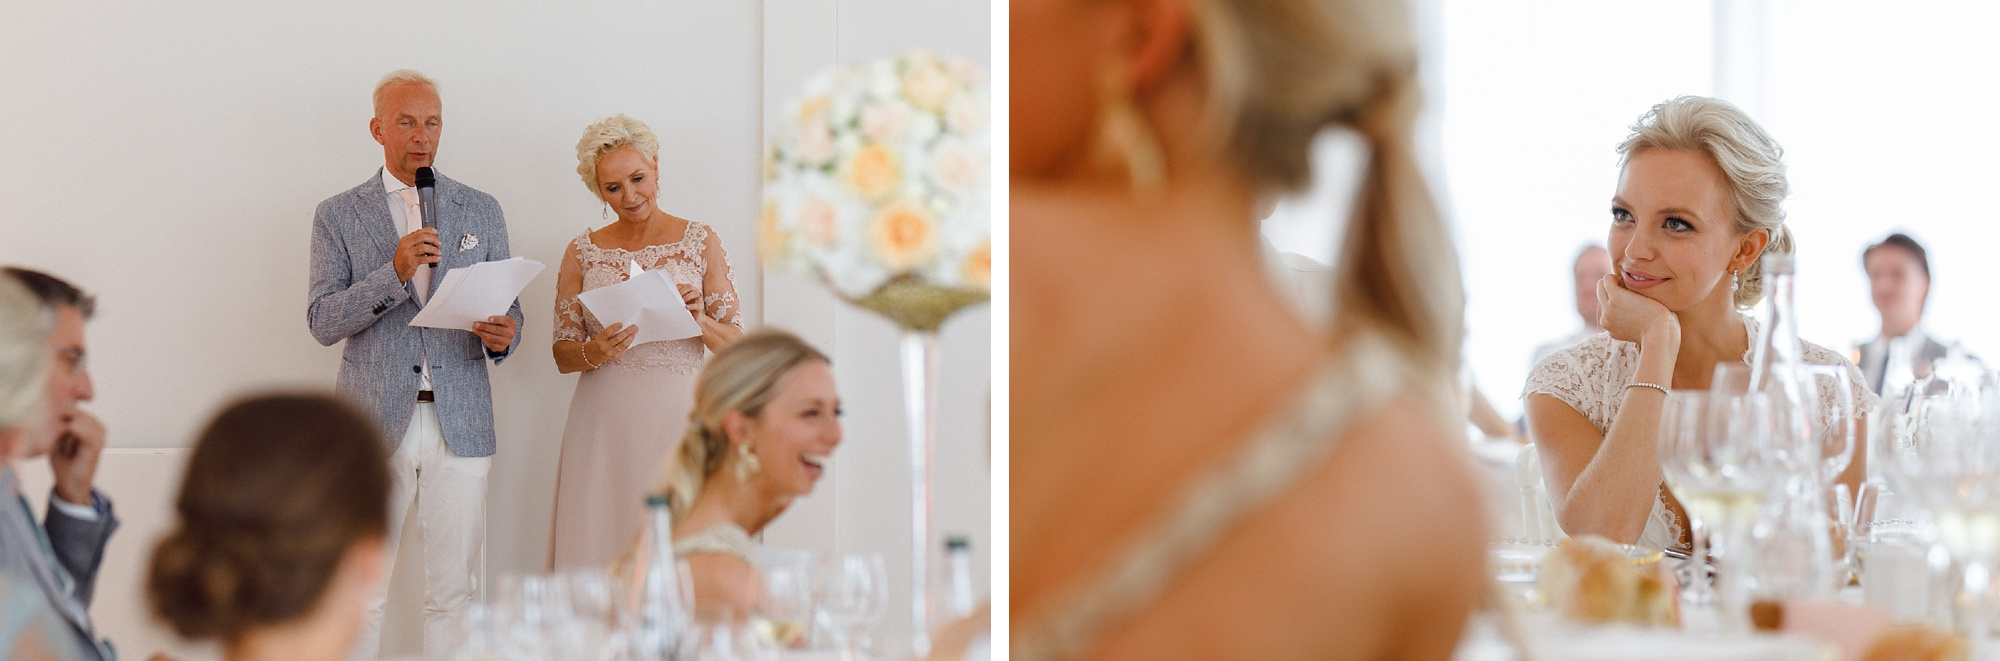 Wedding-Chateau-de-Varennes-080.jpg